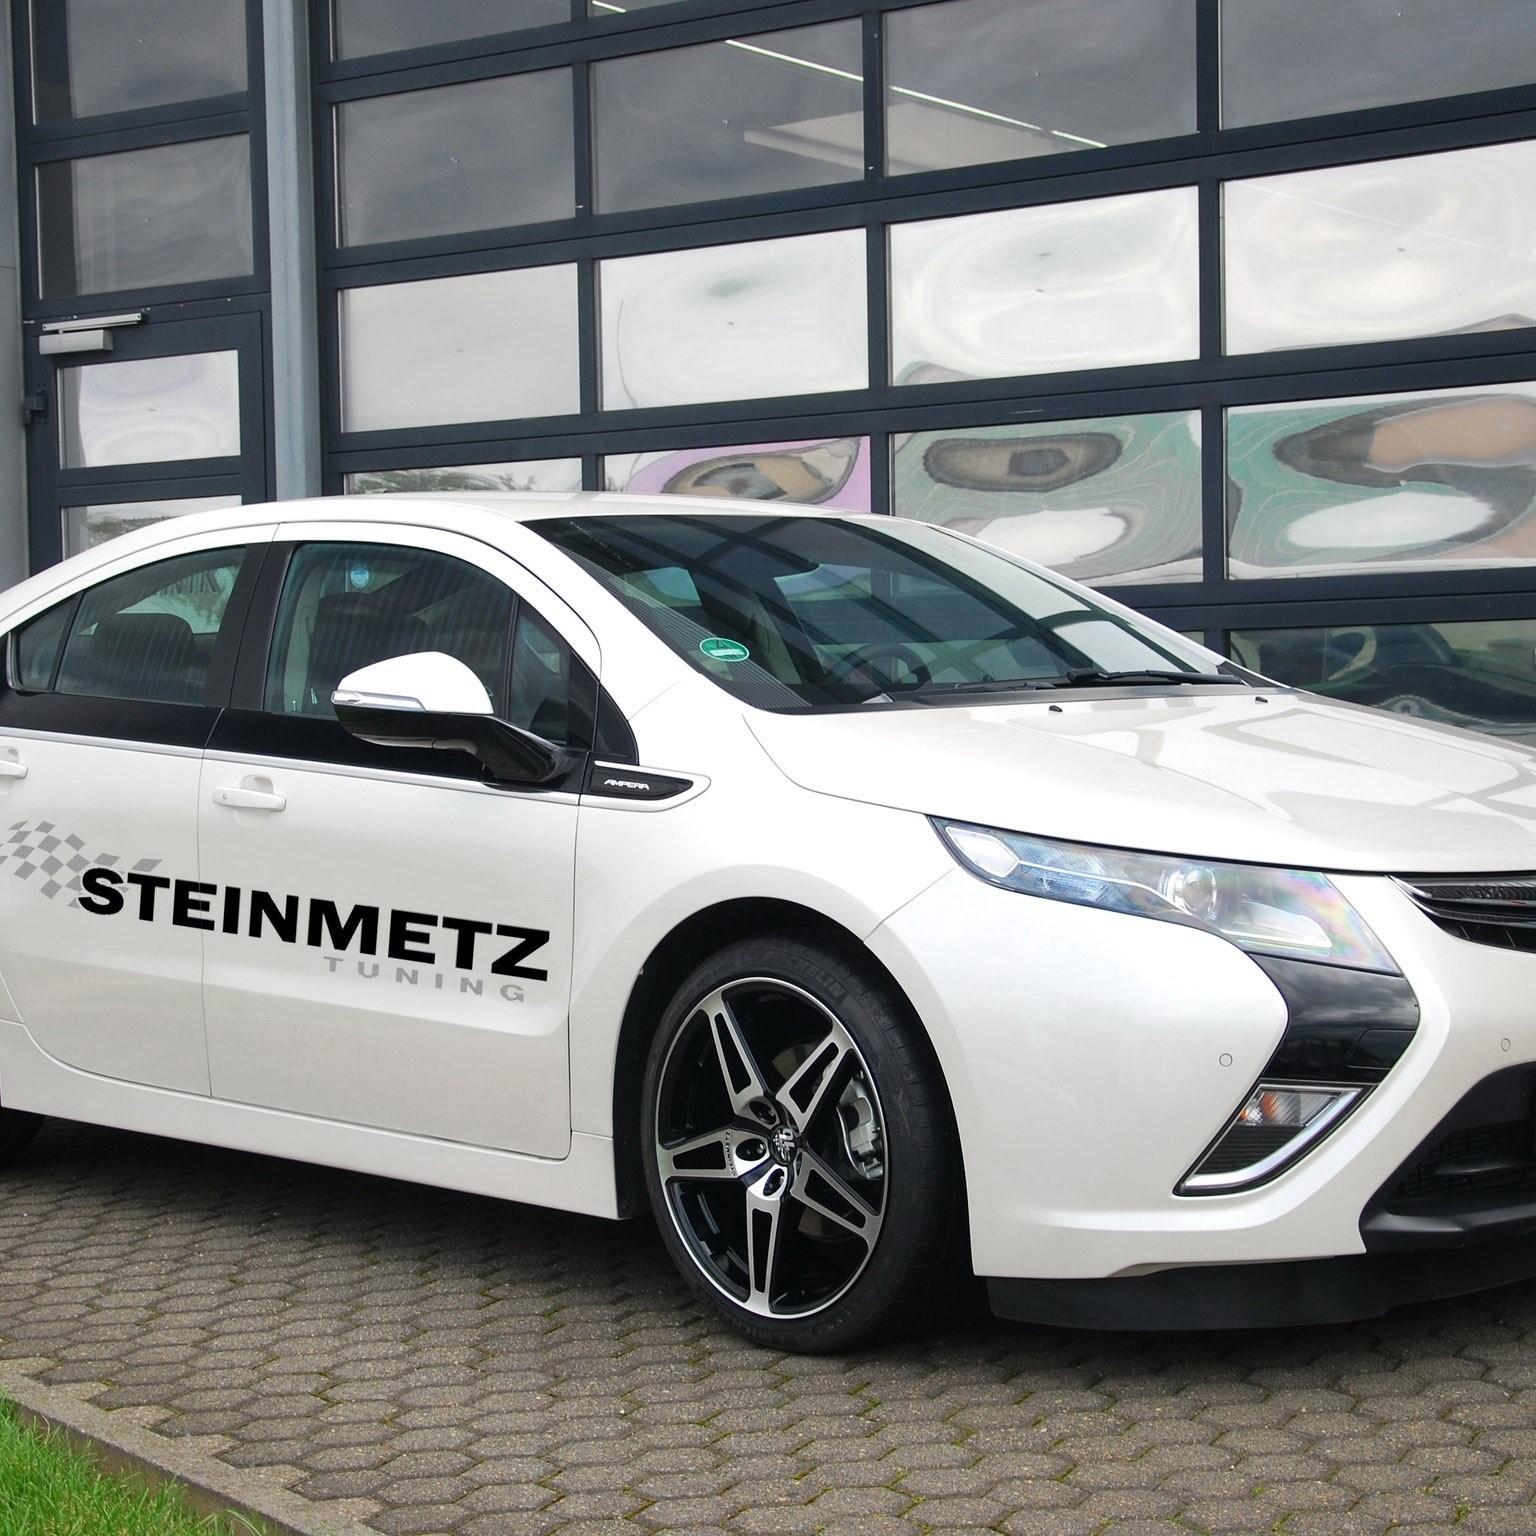 2013 Steinmetz Opel Ampera